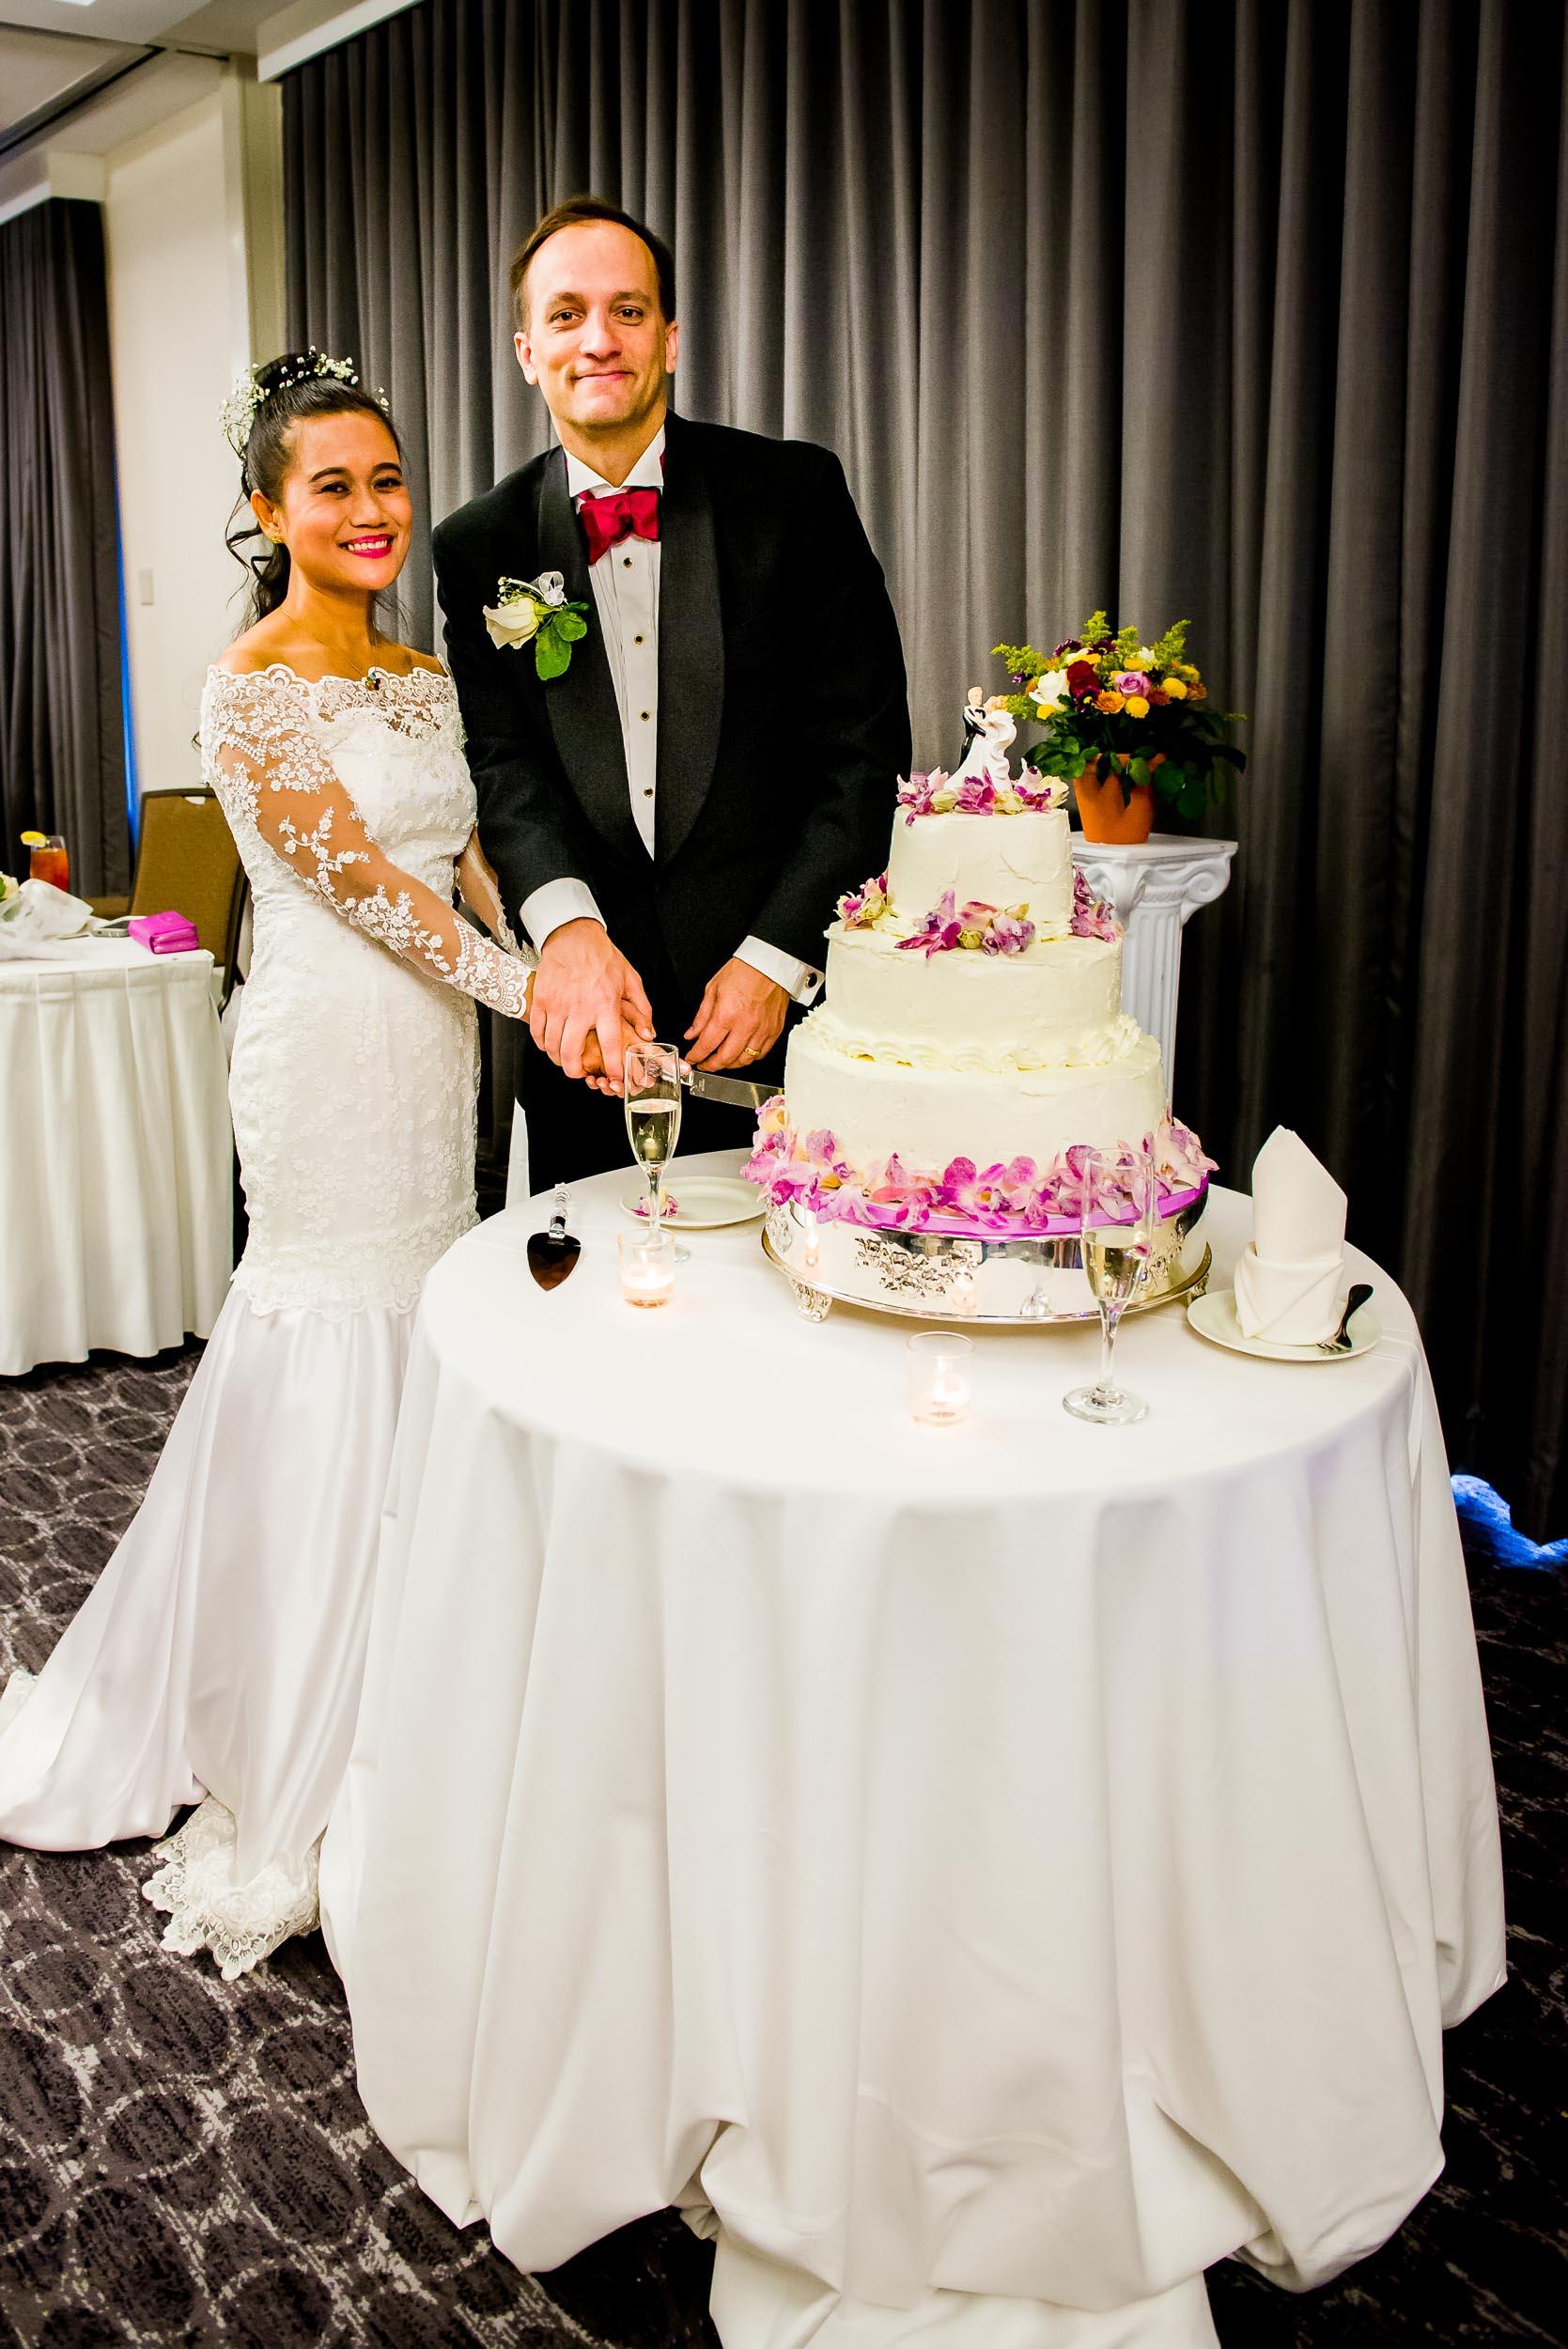 Dennis Soans Photography Weddings Fairfax VA